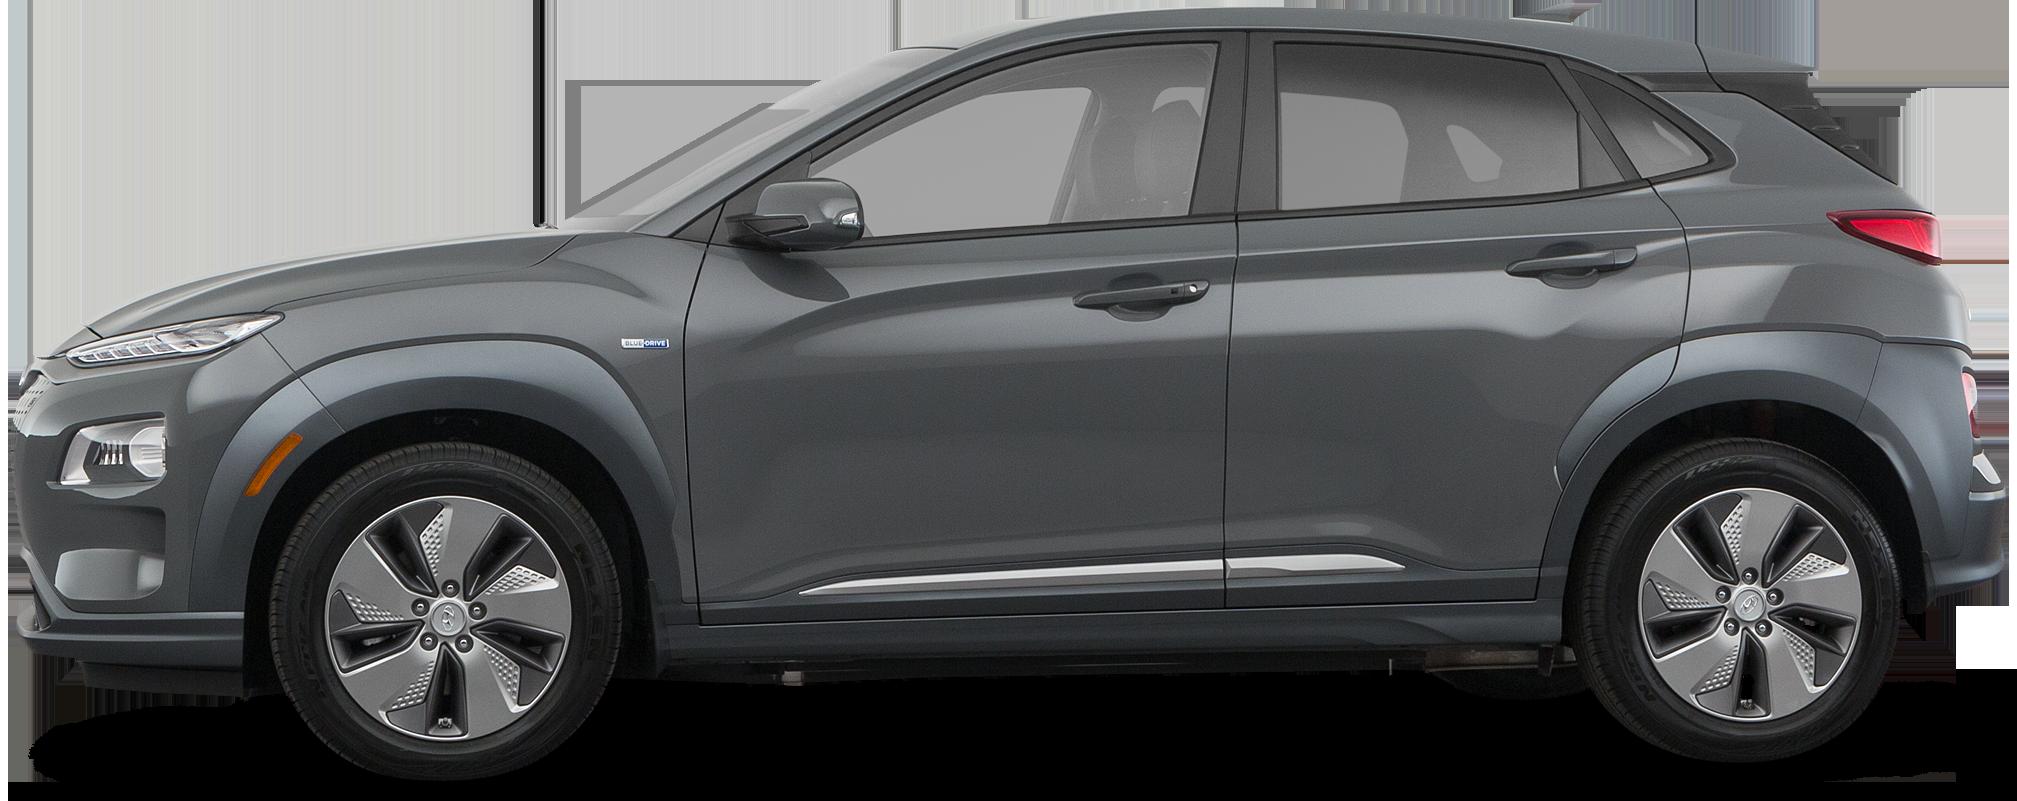 2020 Hyundai Kona EV SUV Limited